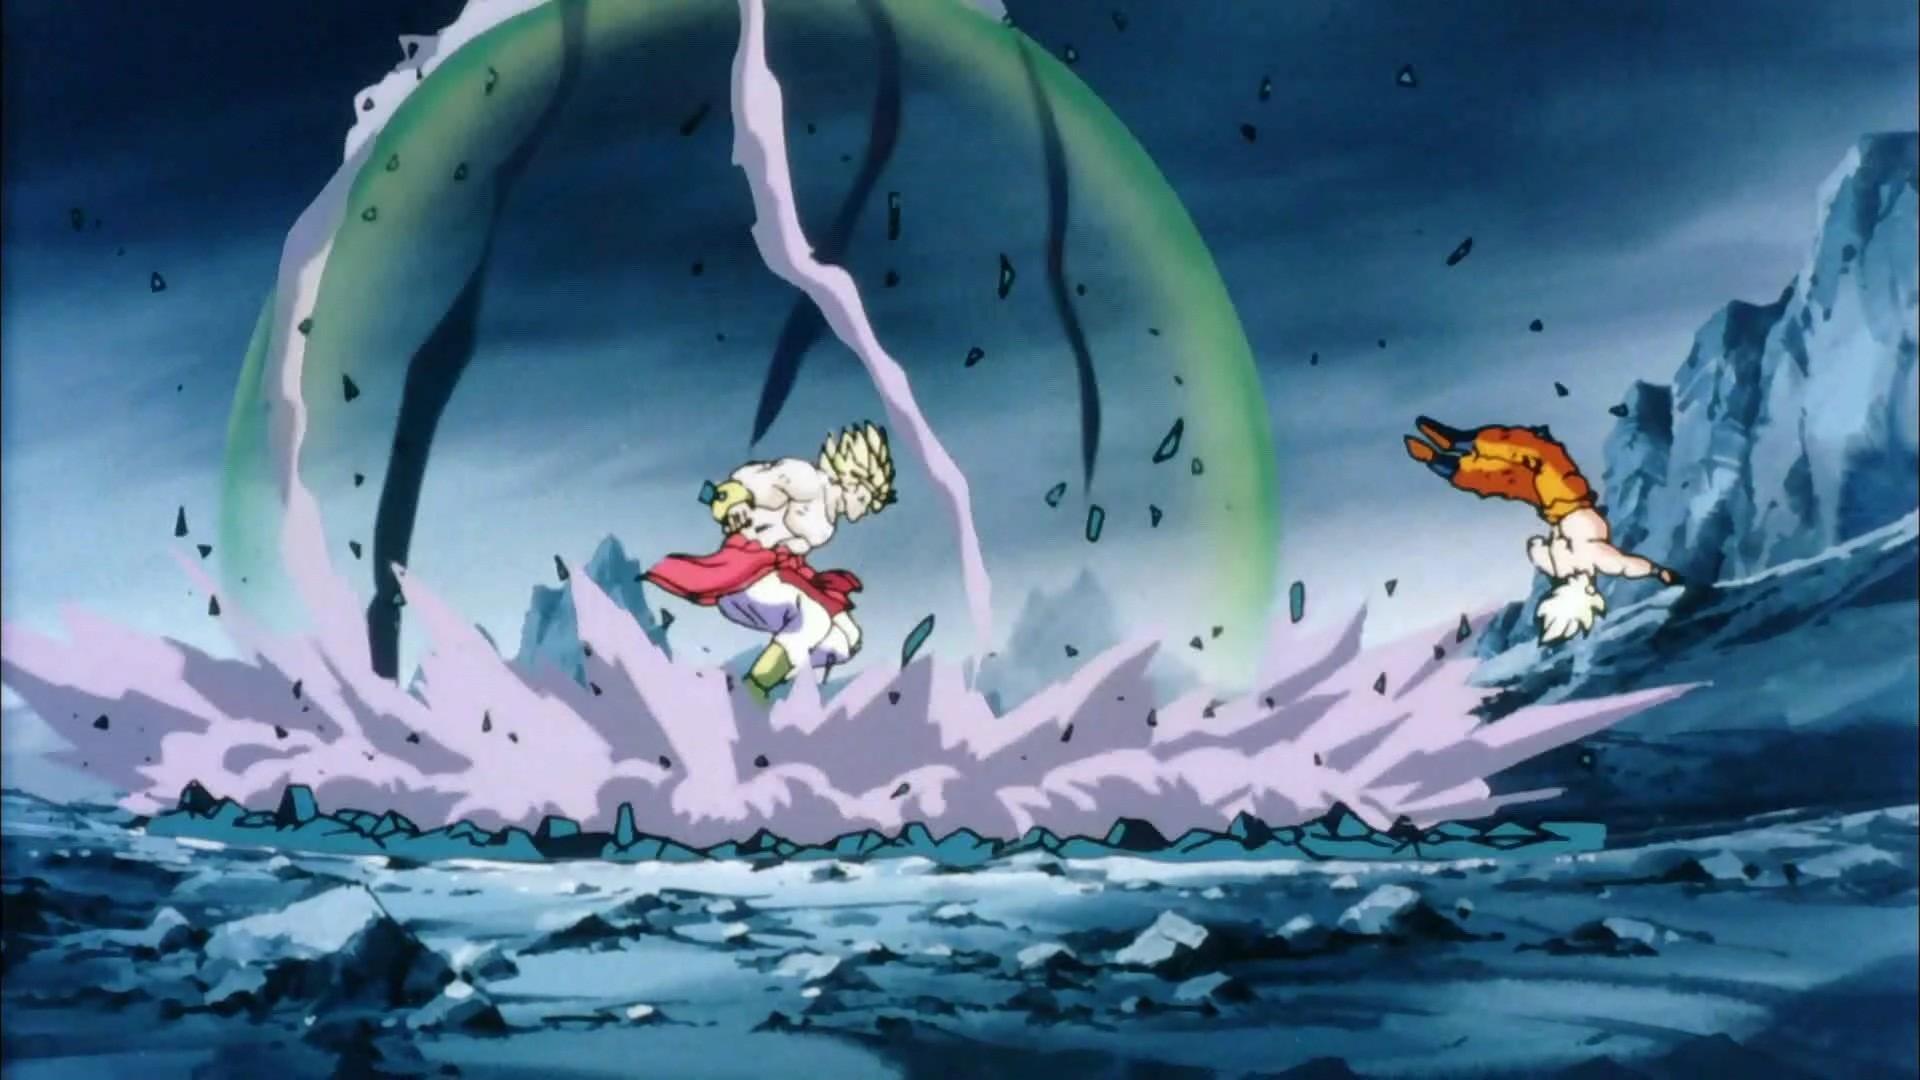 Broly Vs Goku.jpg